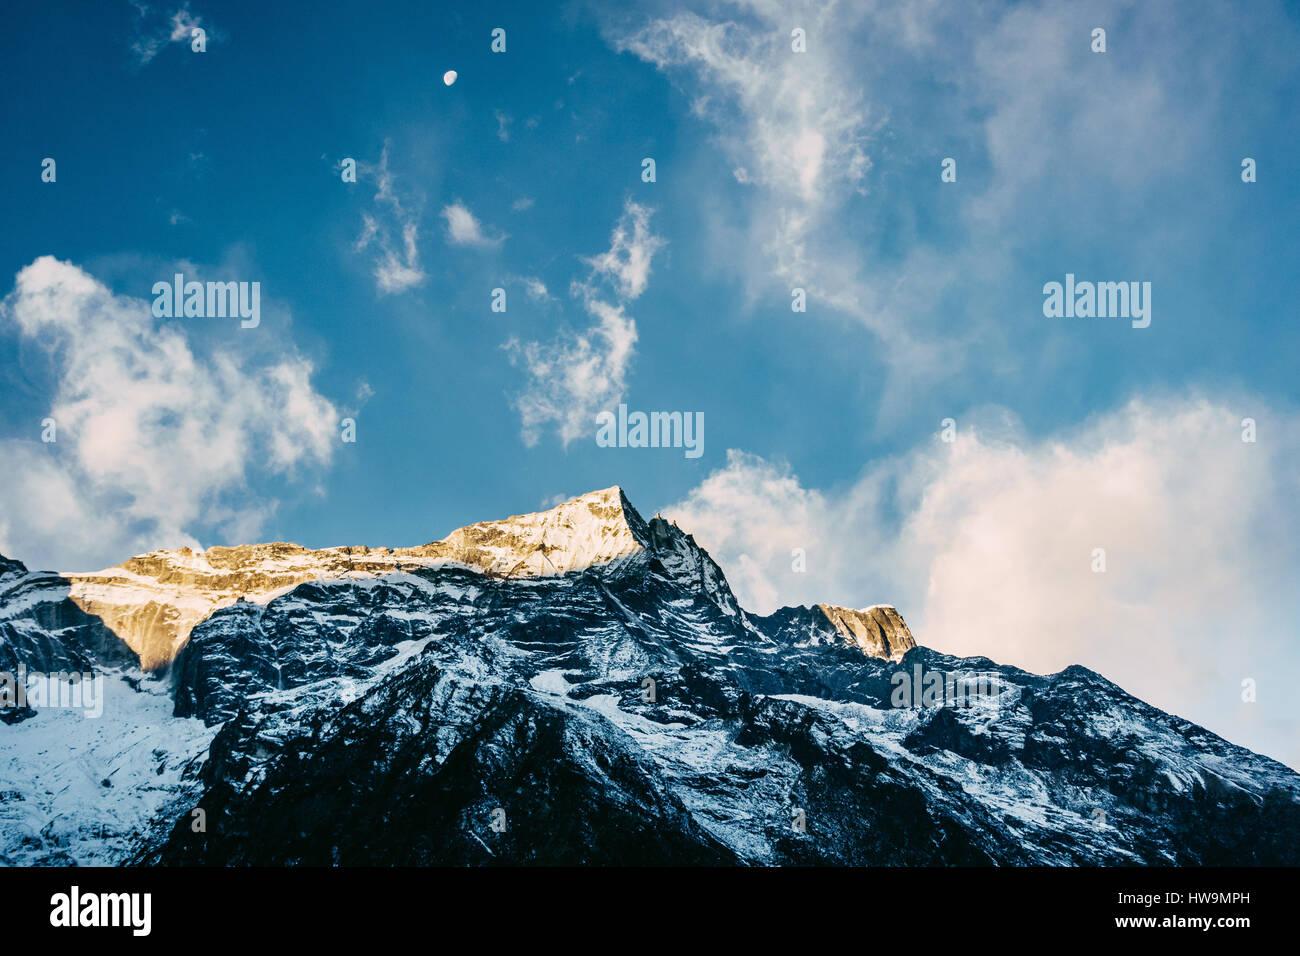 Kondge Ri mountain in the Himalayas near Namche Bazaar, Nepal - Stock Image